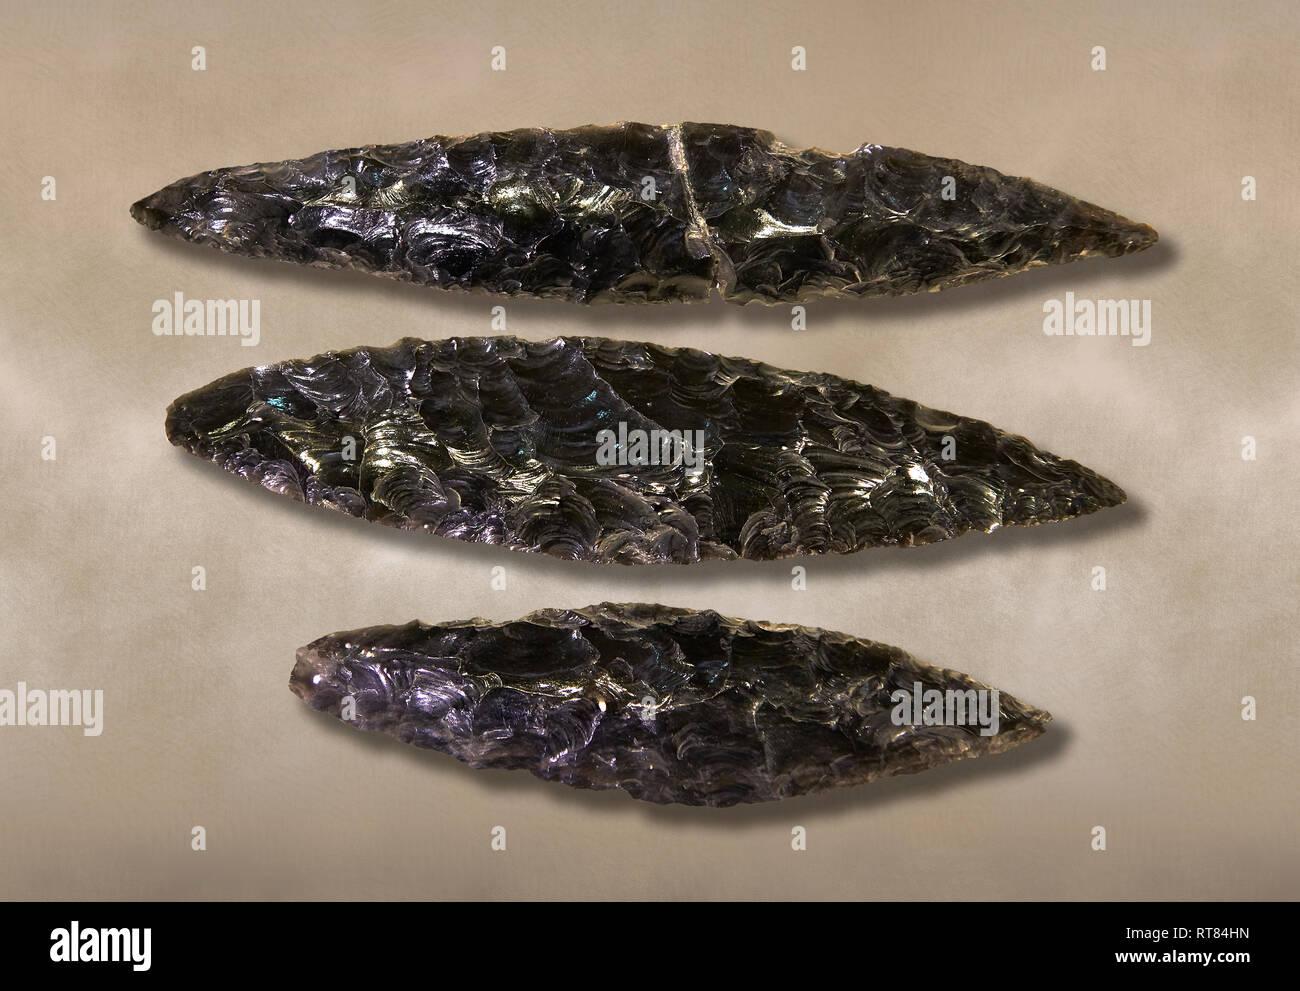 Black obsidian blades. Catalhoyuk Collections. Museum of Anatolian Civilisations, Ankara - Stock Image